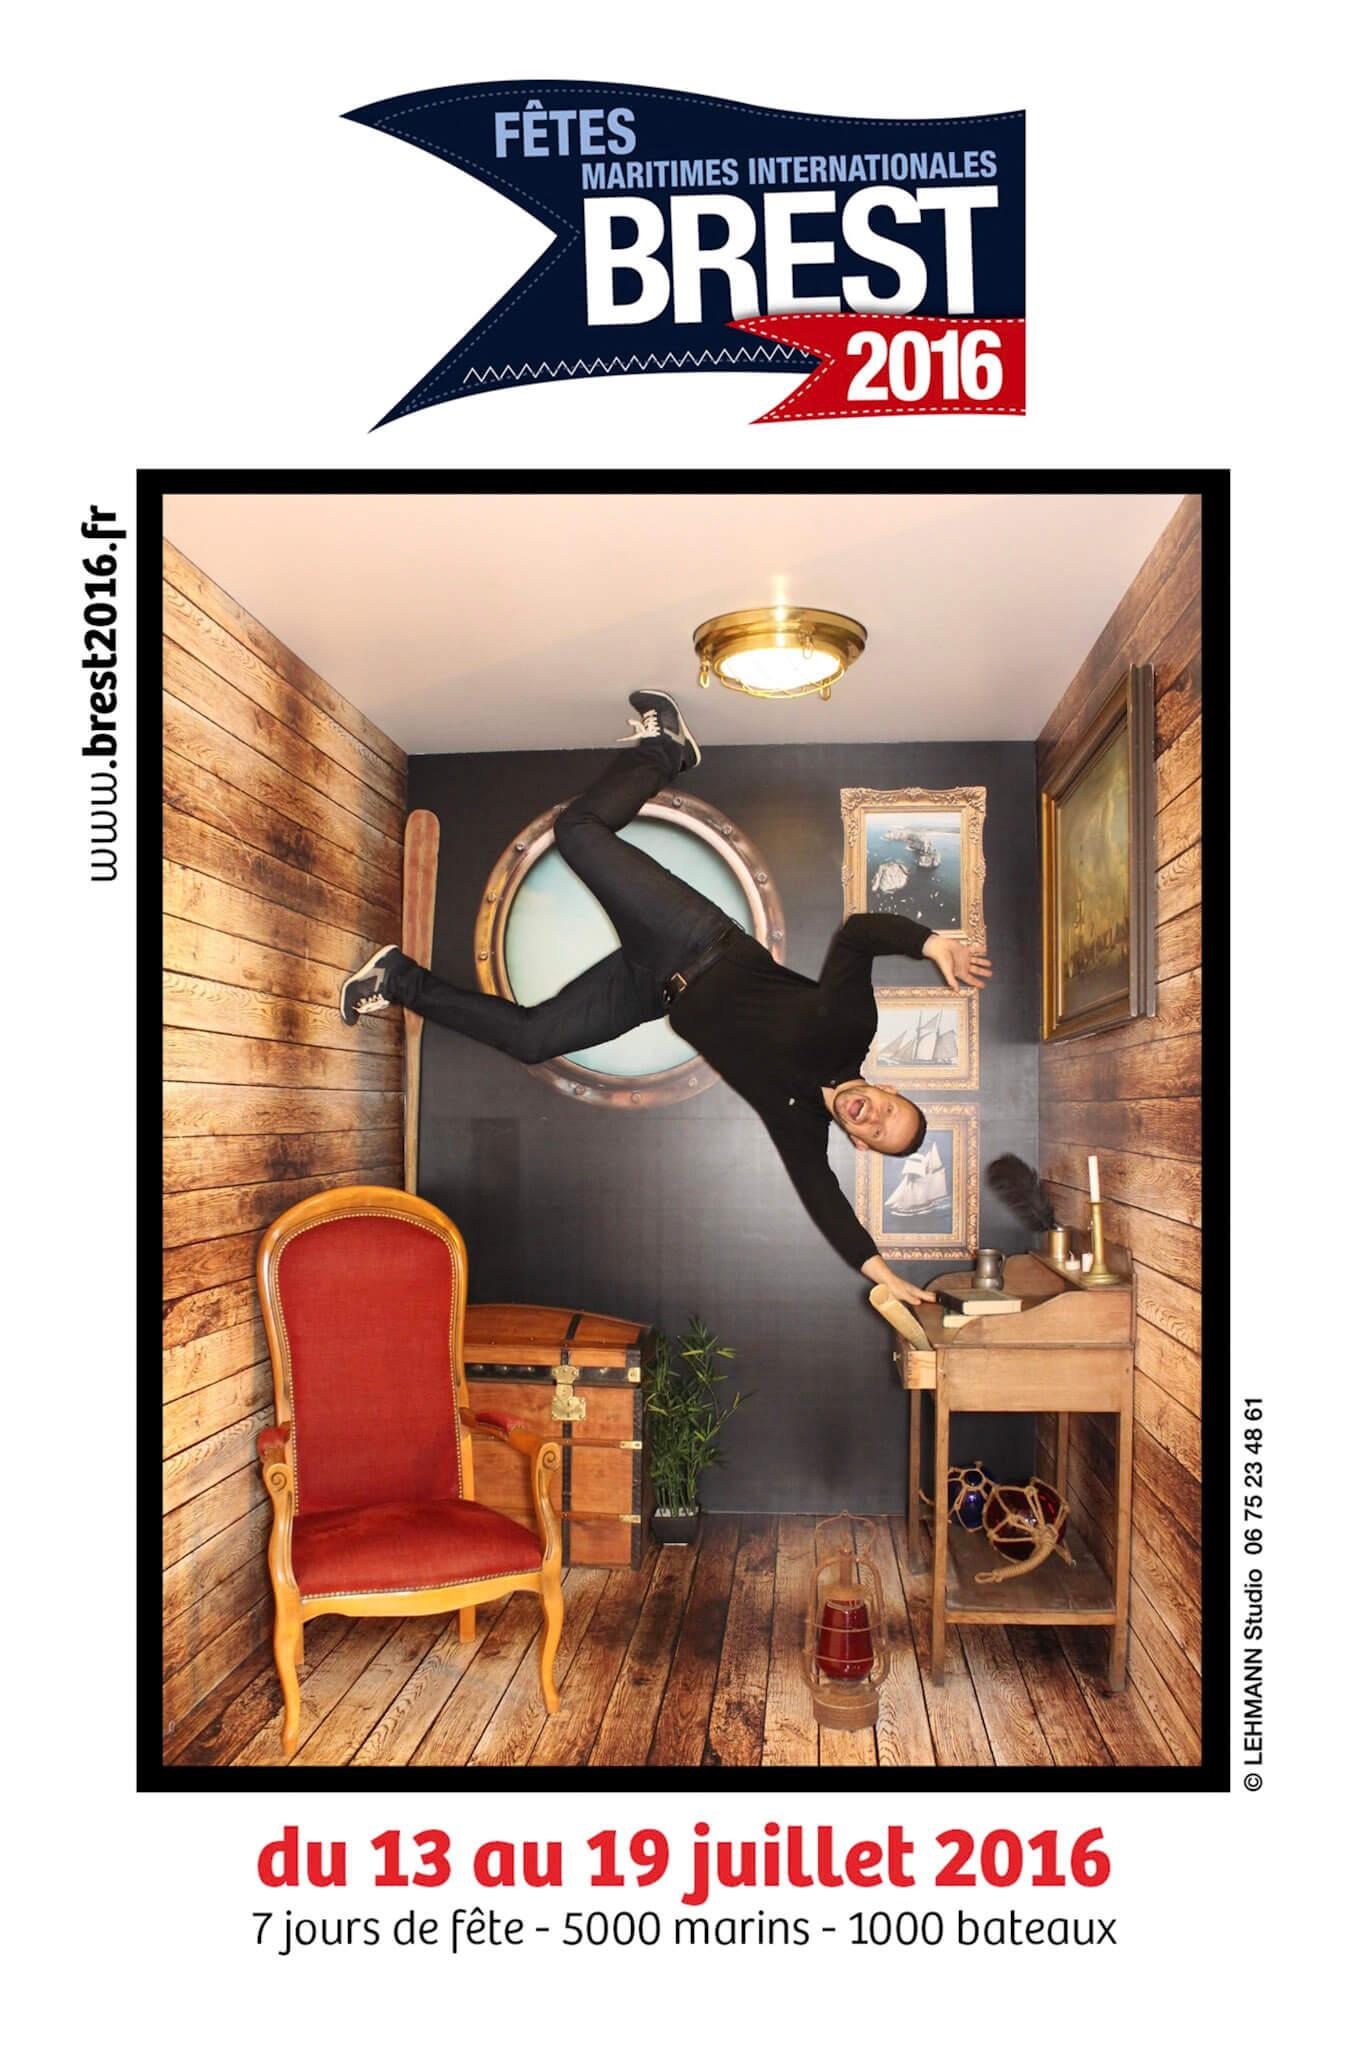 lehman-studio-photographe-angers-evenementiel-gravitybox-ambiance-bateau-brest-2016